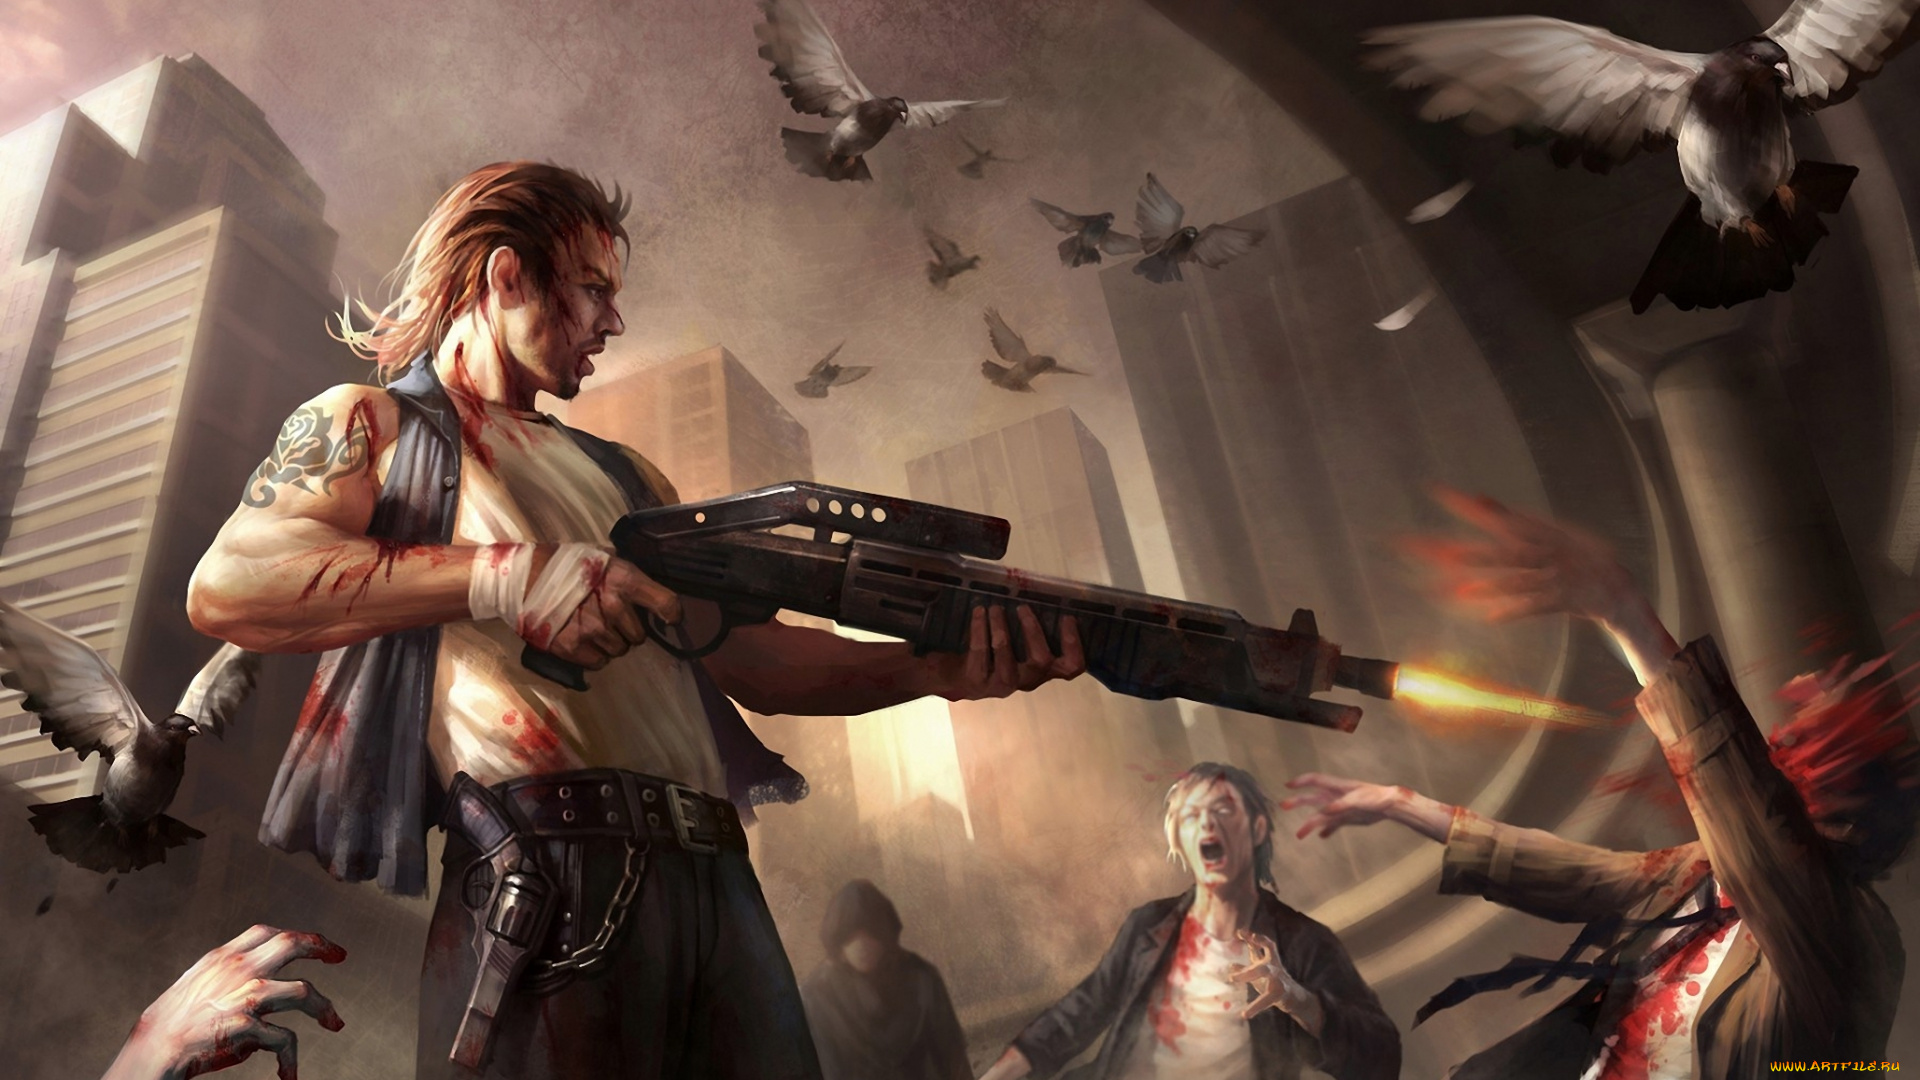 https://i.artfile.me/wallpaper/13-06-2012/1920x1080/fentezi-lyudi-zombi-golubi-drobovik-640170.jpg